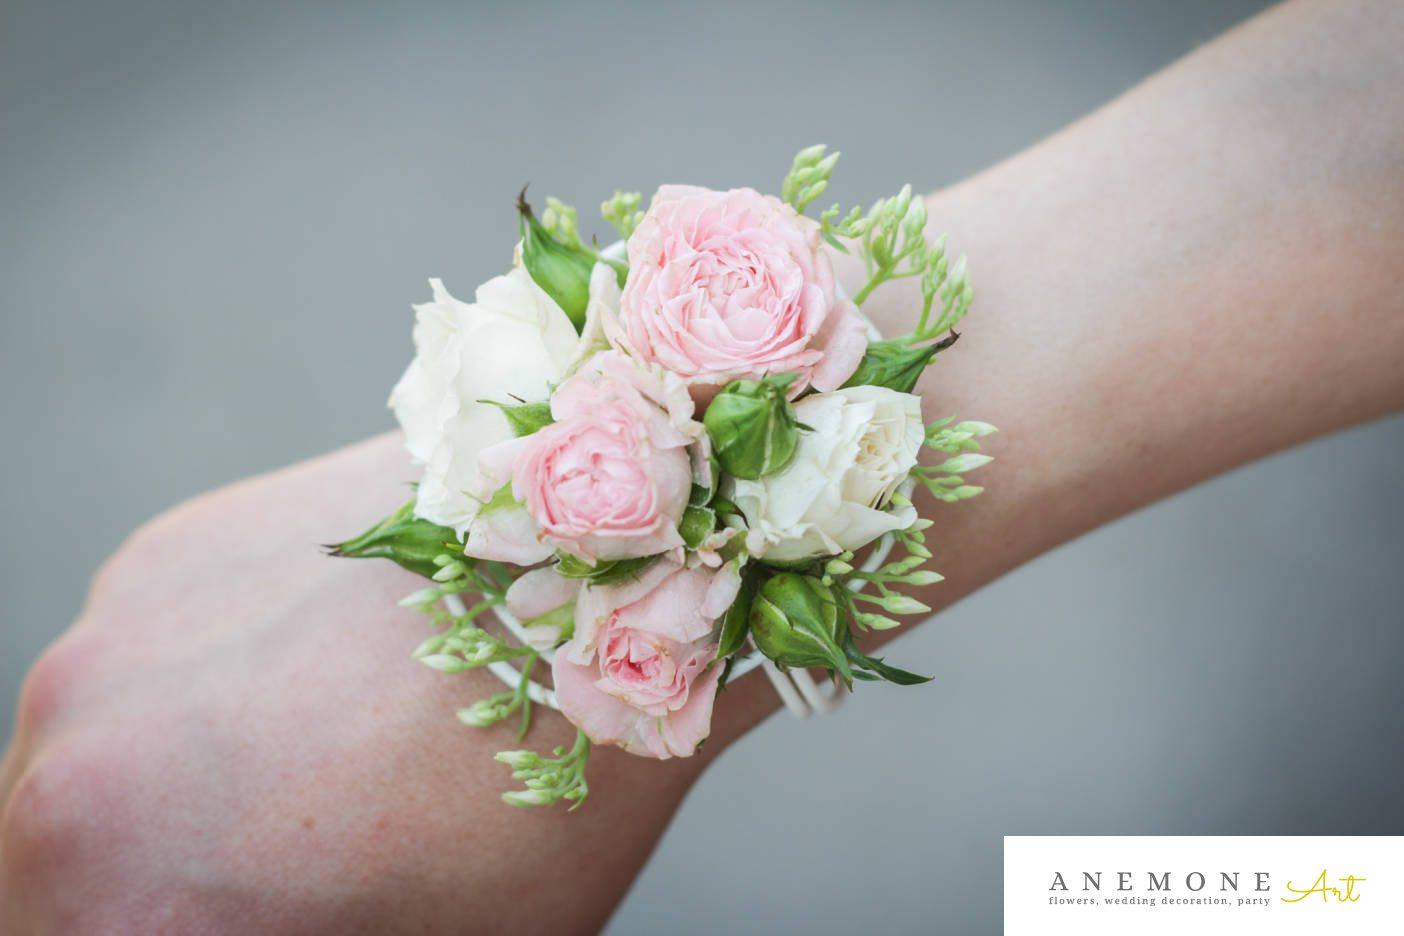 Poza, foto cu Flori de nunta alb, bratara, mini-rosa, roz in Arad, Timisoara, Oradea (wedding flowers, bouquets) nunta Arad, Timisoara, Oradea